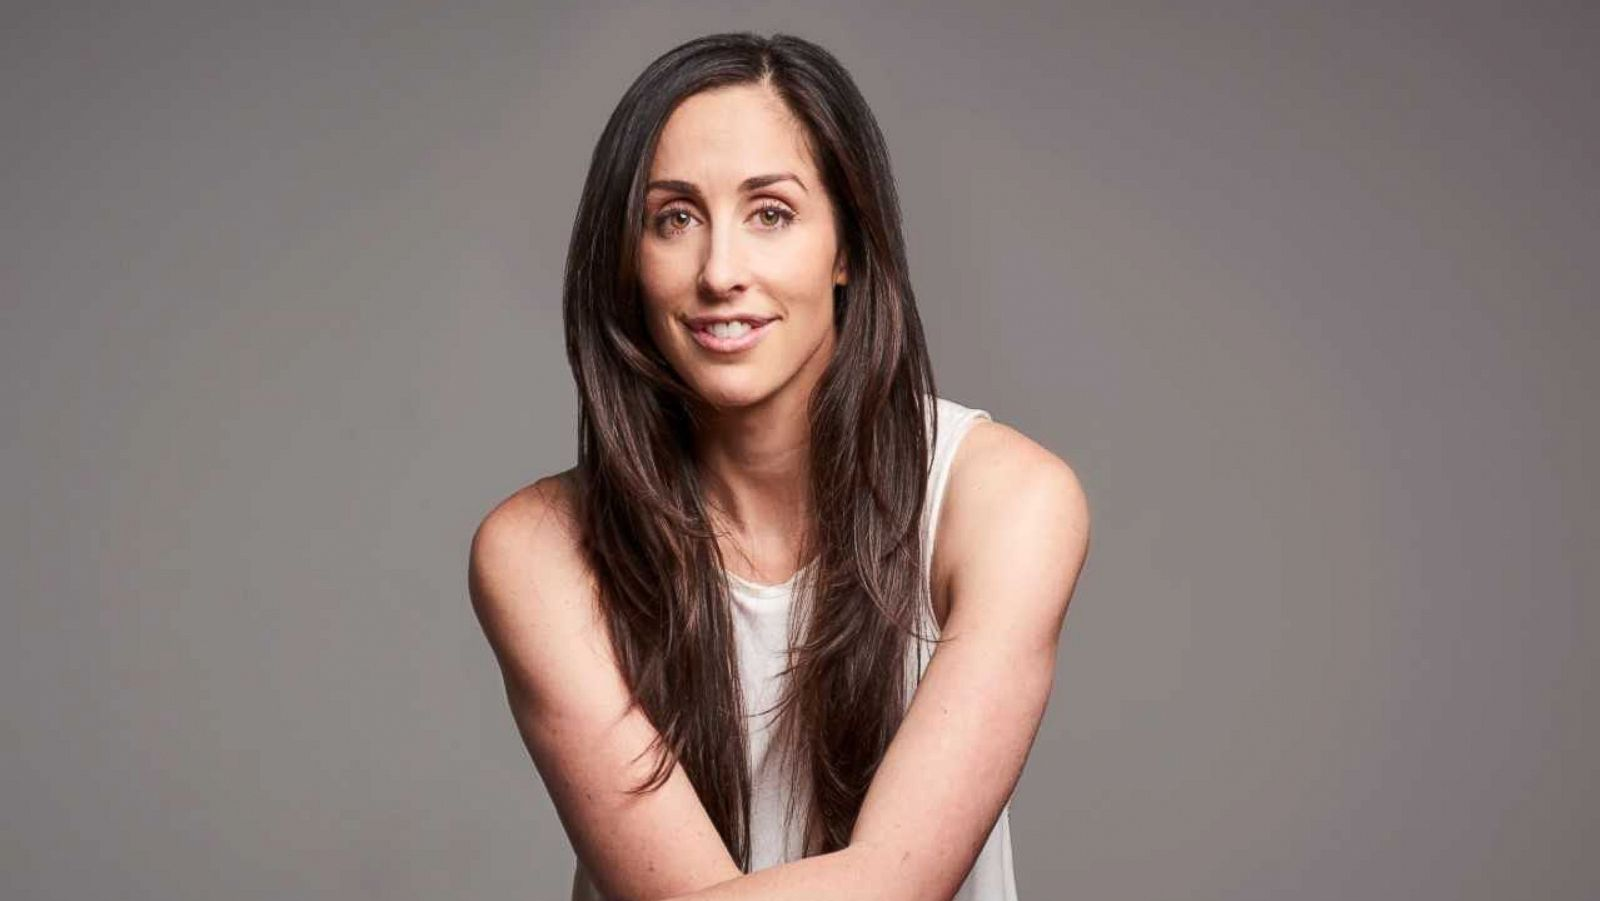 Creator of Netflix's 'Workin Moms' on how a postpartum